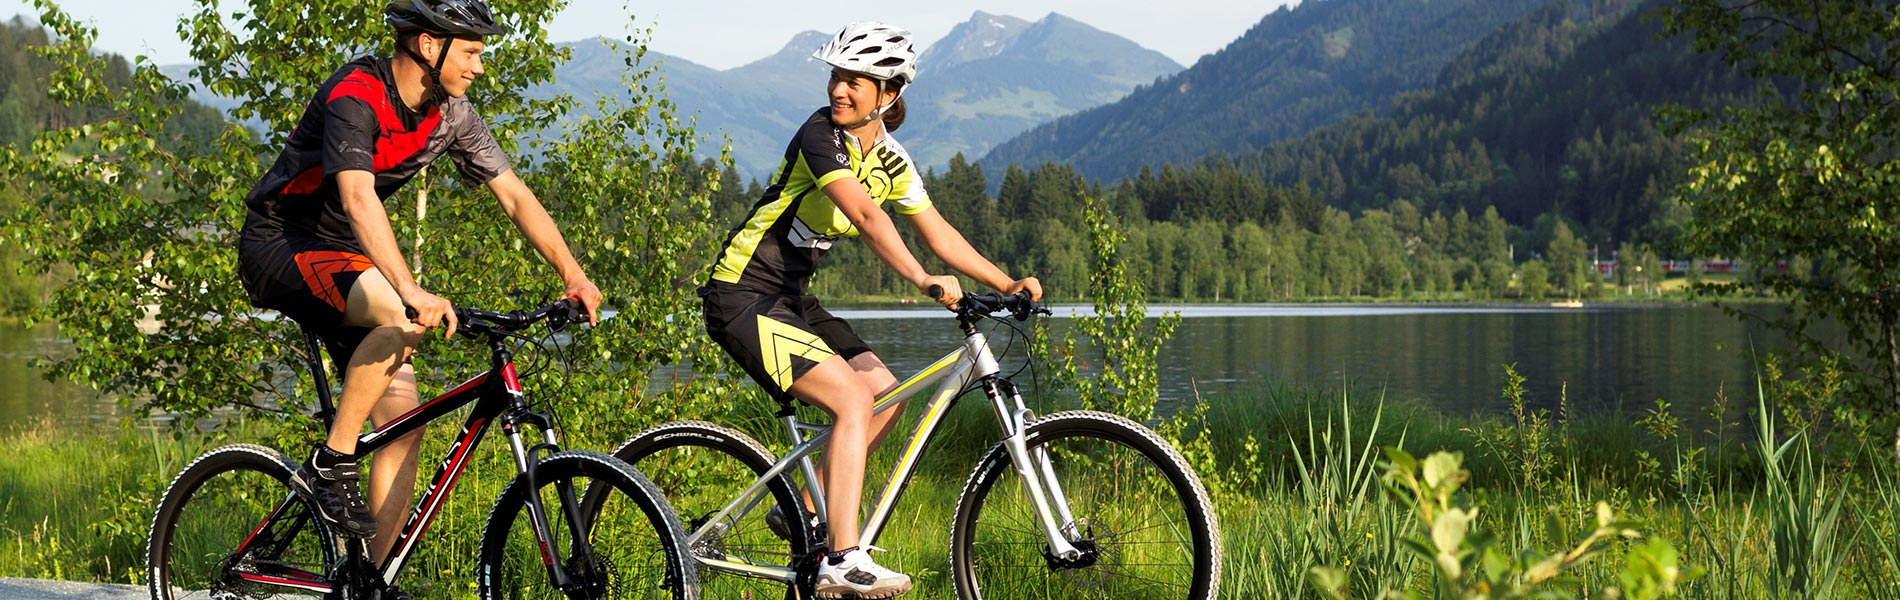 Bikeurlaub in Tirol Hotel Rosengarten 5 Sterne Hotel Relais & Châteaux Hotel Kirchberg Tirol Austria